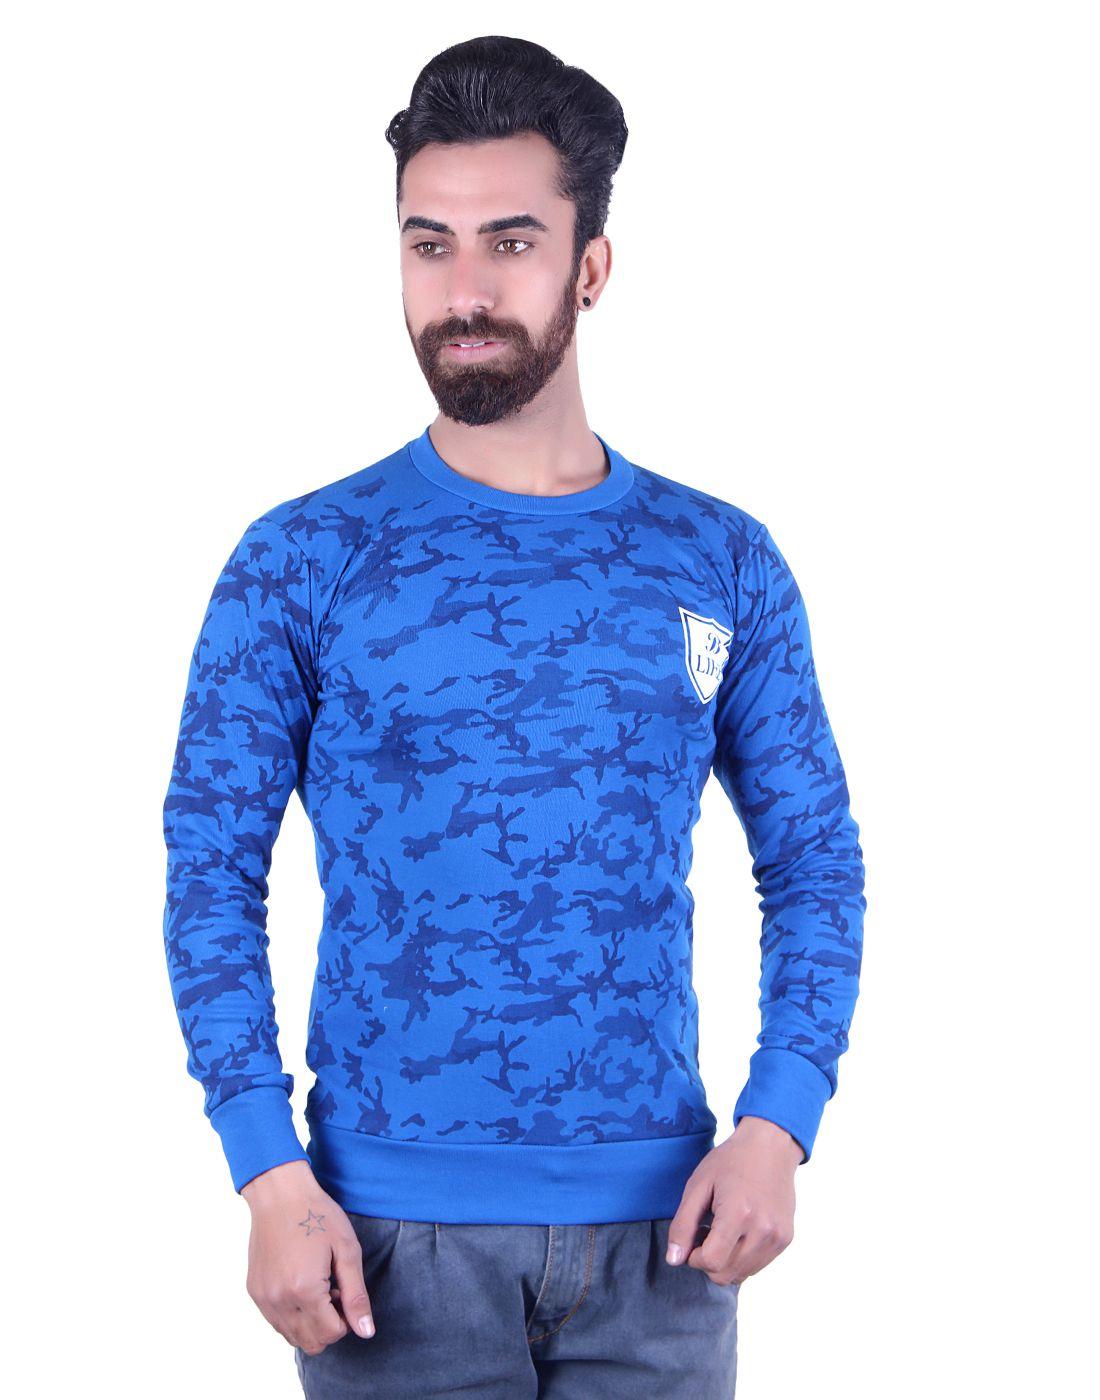 B-Life Blue Round T-Shirt Pack of 1